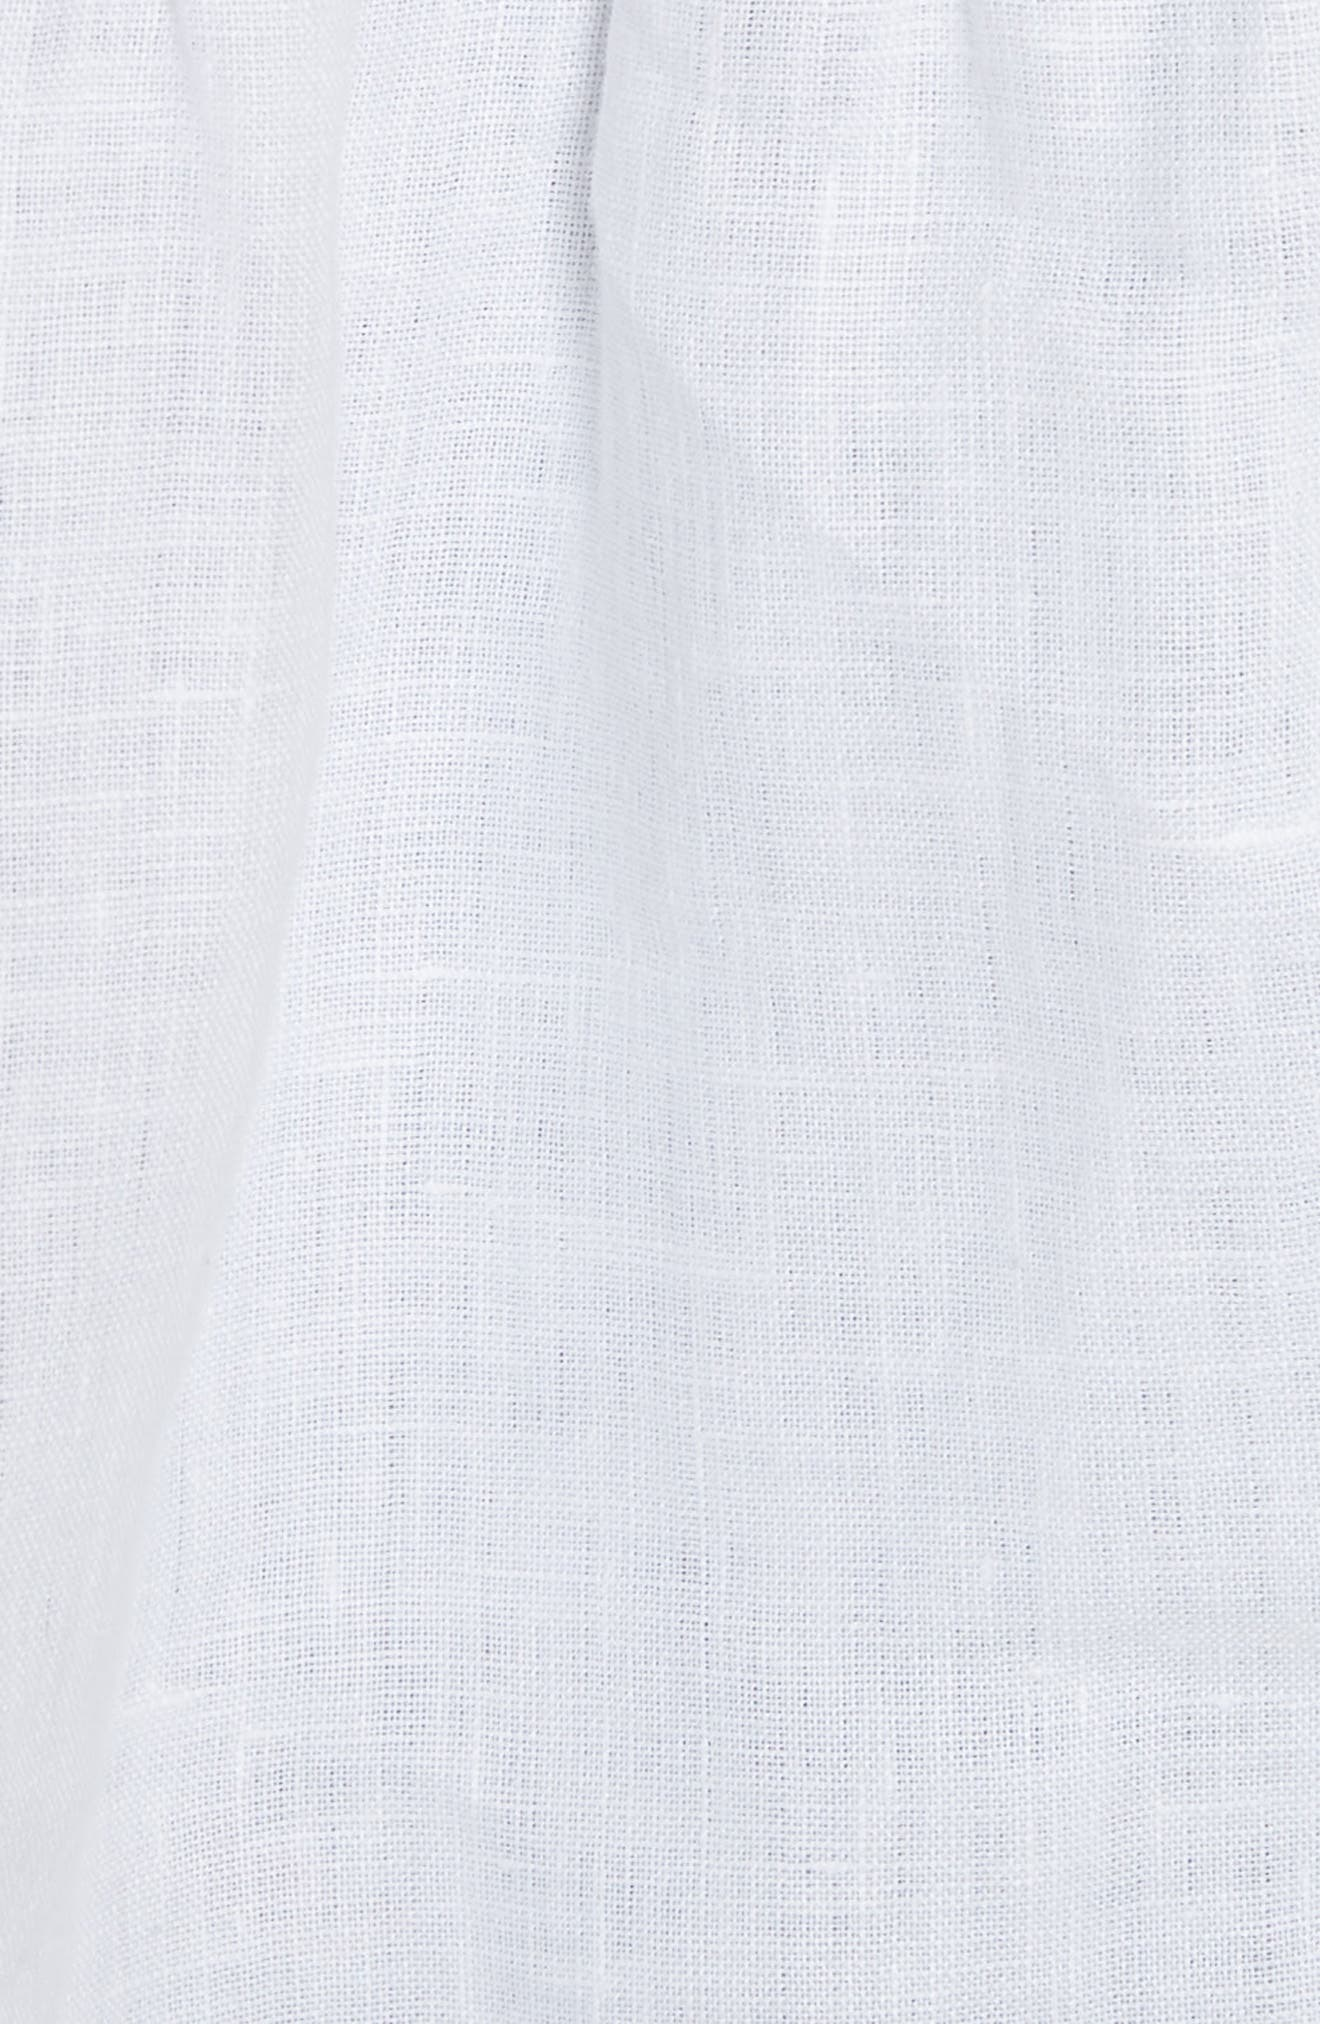 Embroidered Linen Tank,                             Alternate thumbnail 5, color,                             Milk